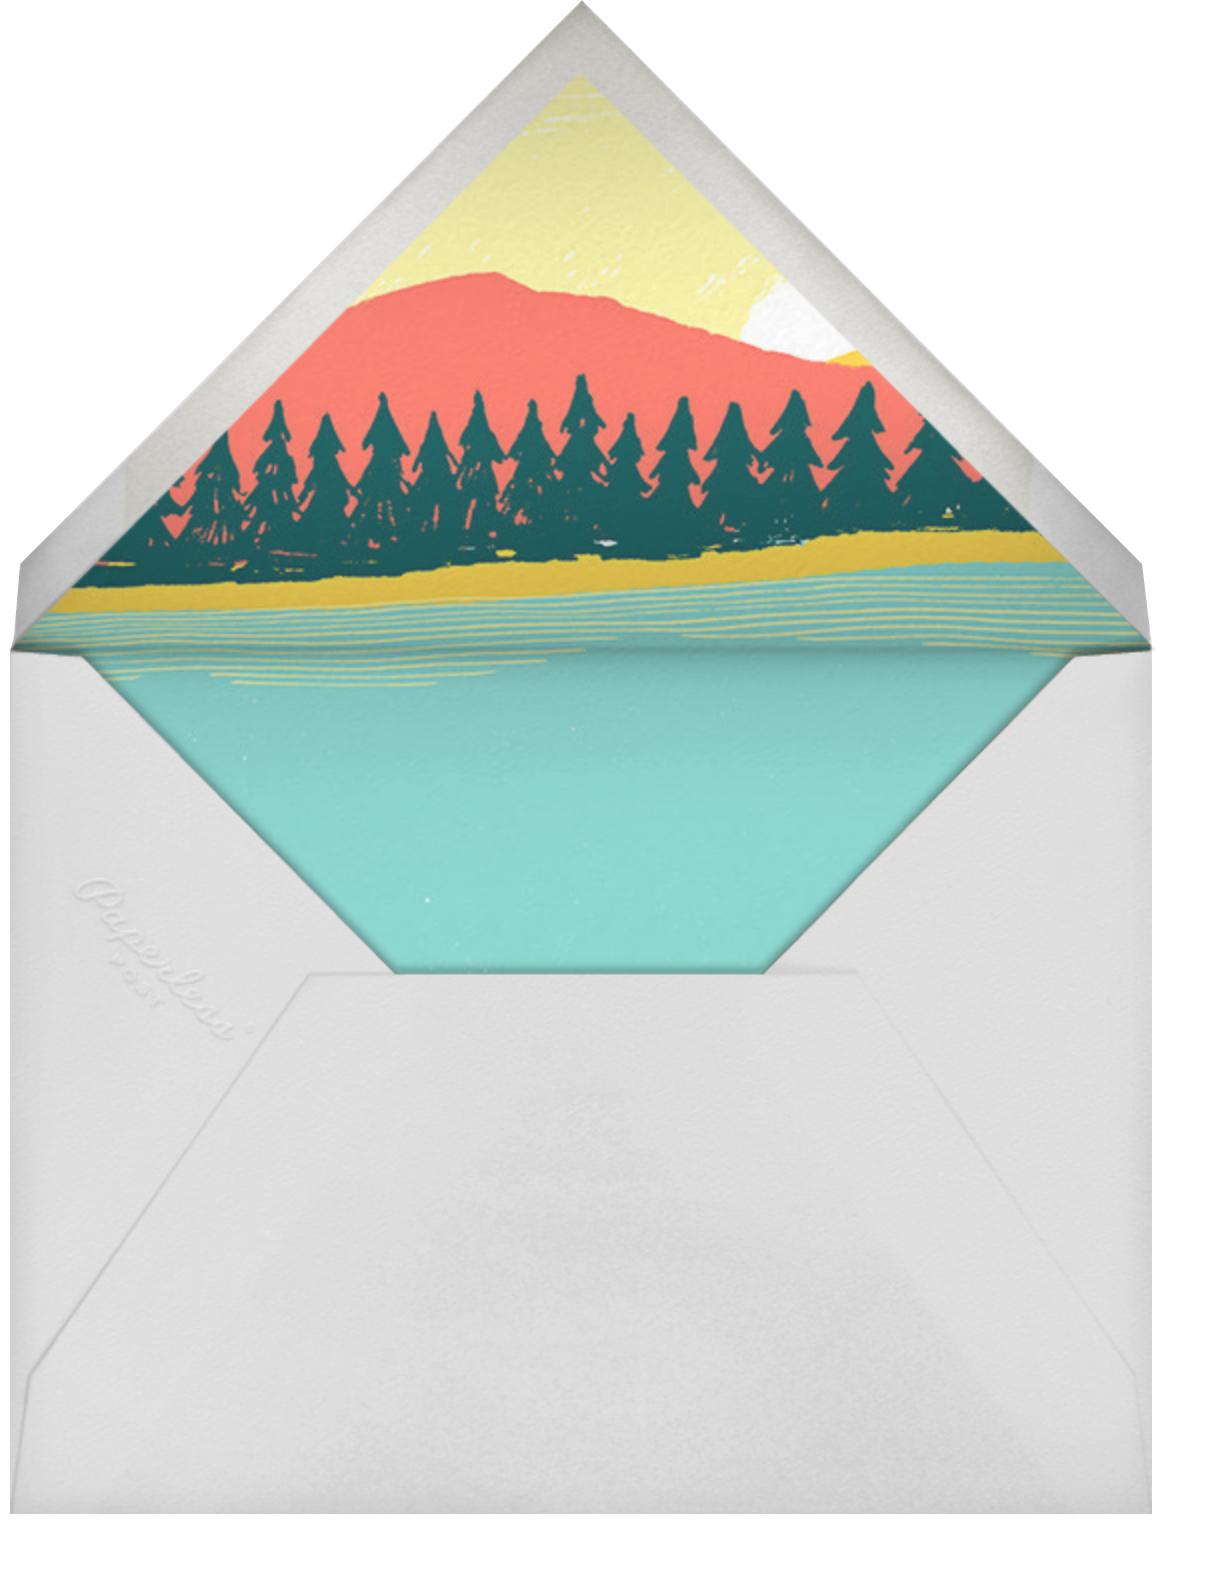 Muskoka Sunset - Paperless Post - Bonfire Party - envelope back